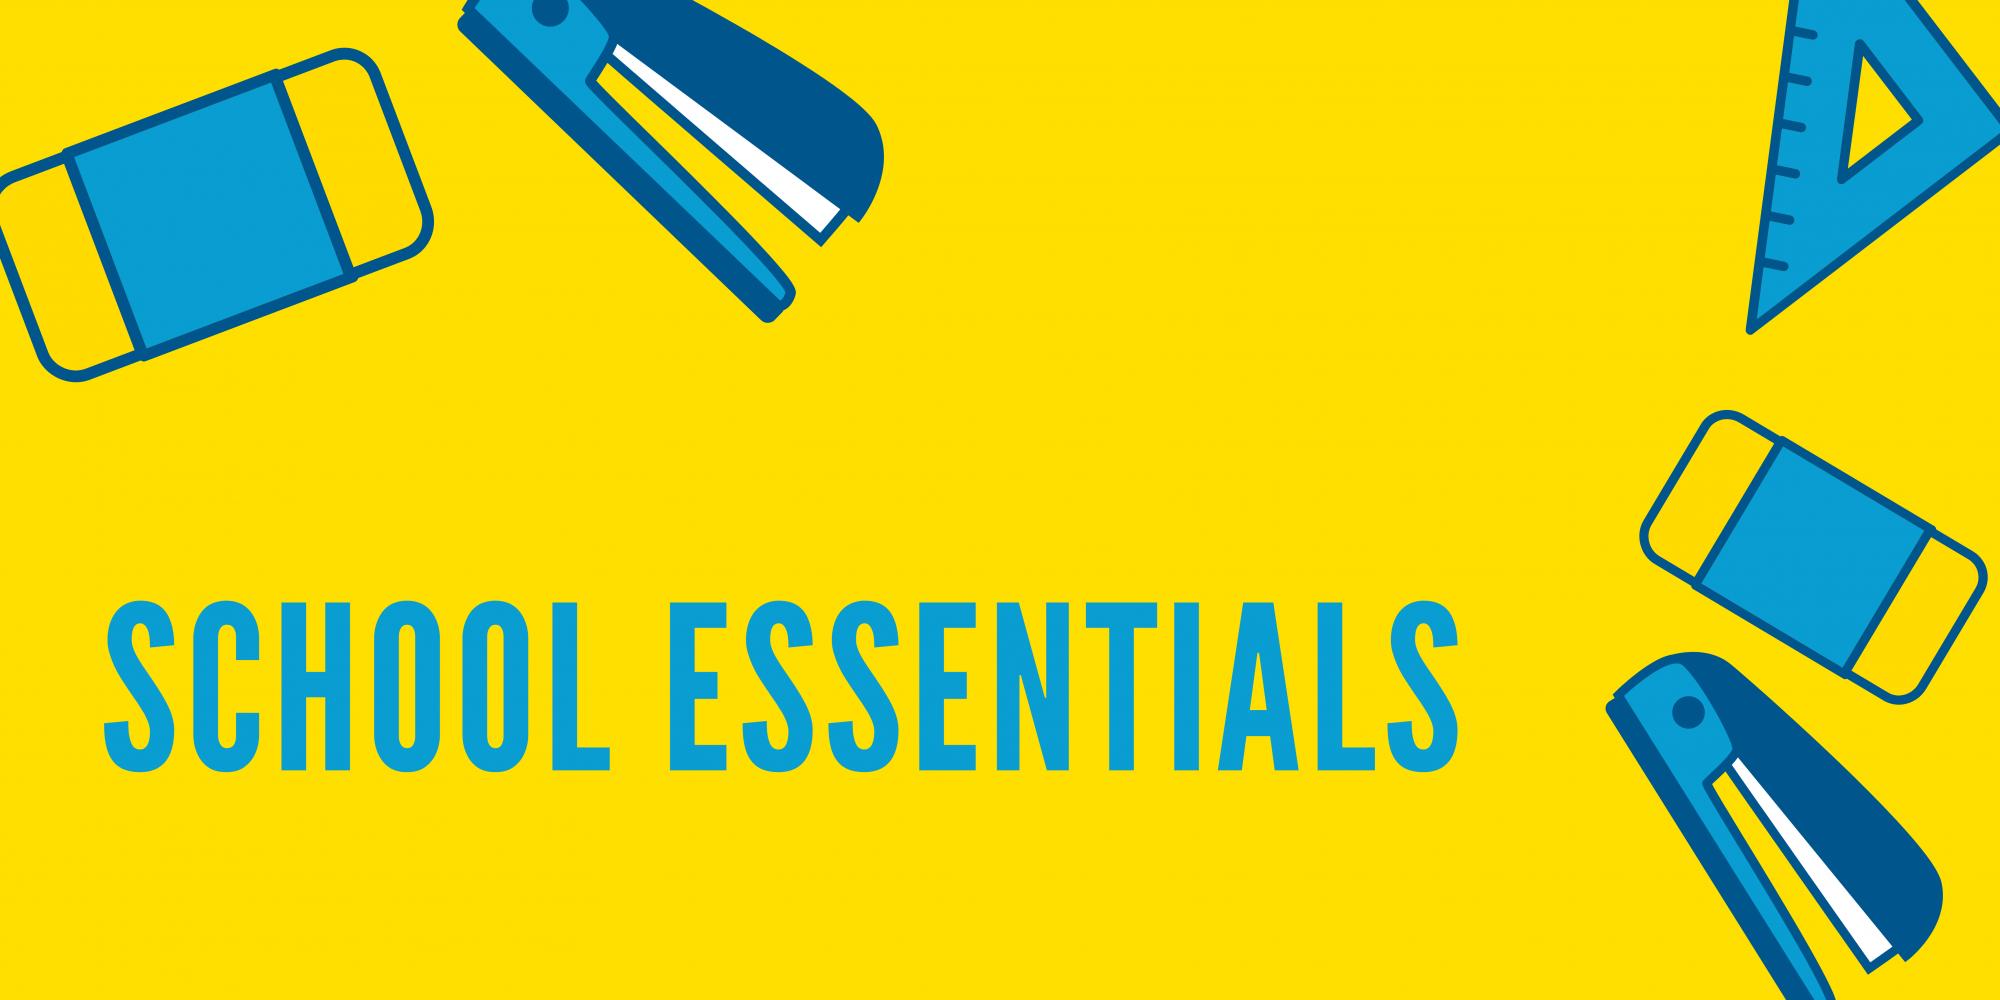 School Essentials